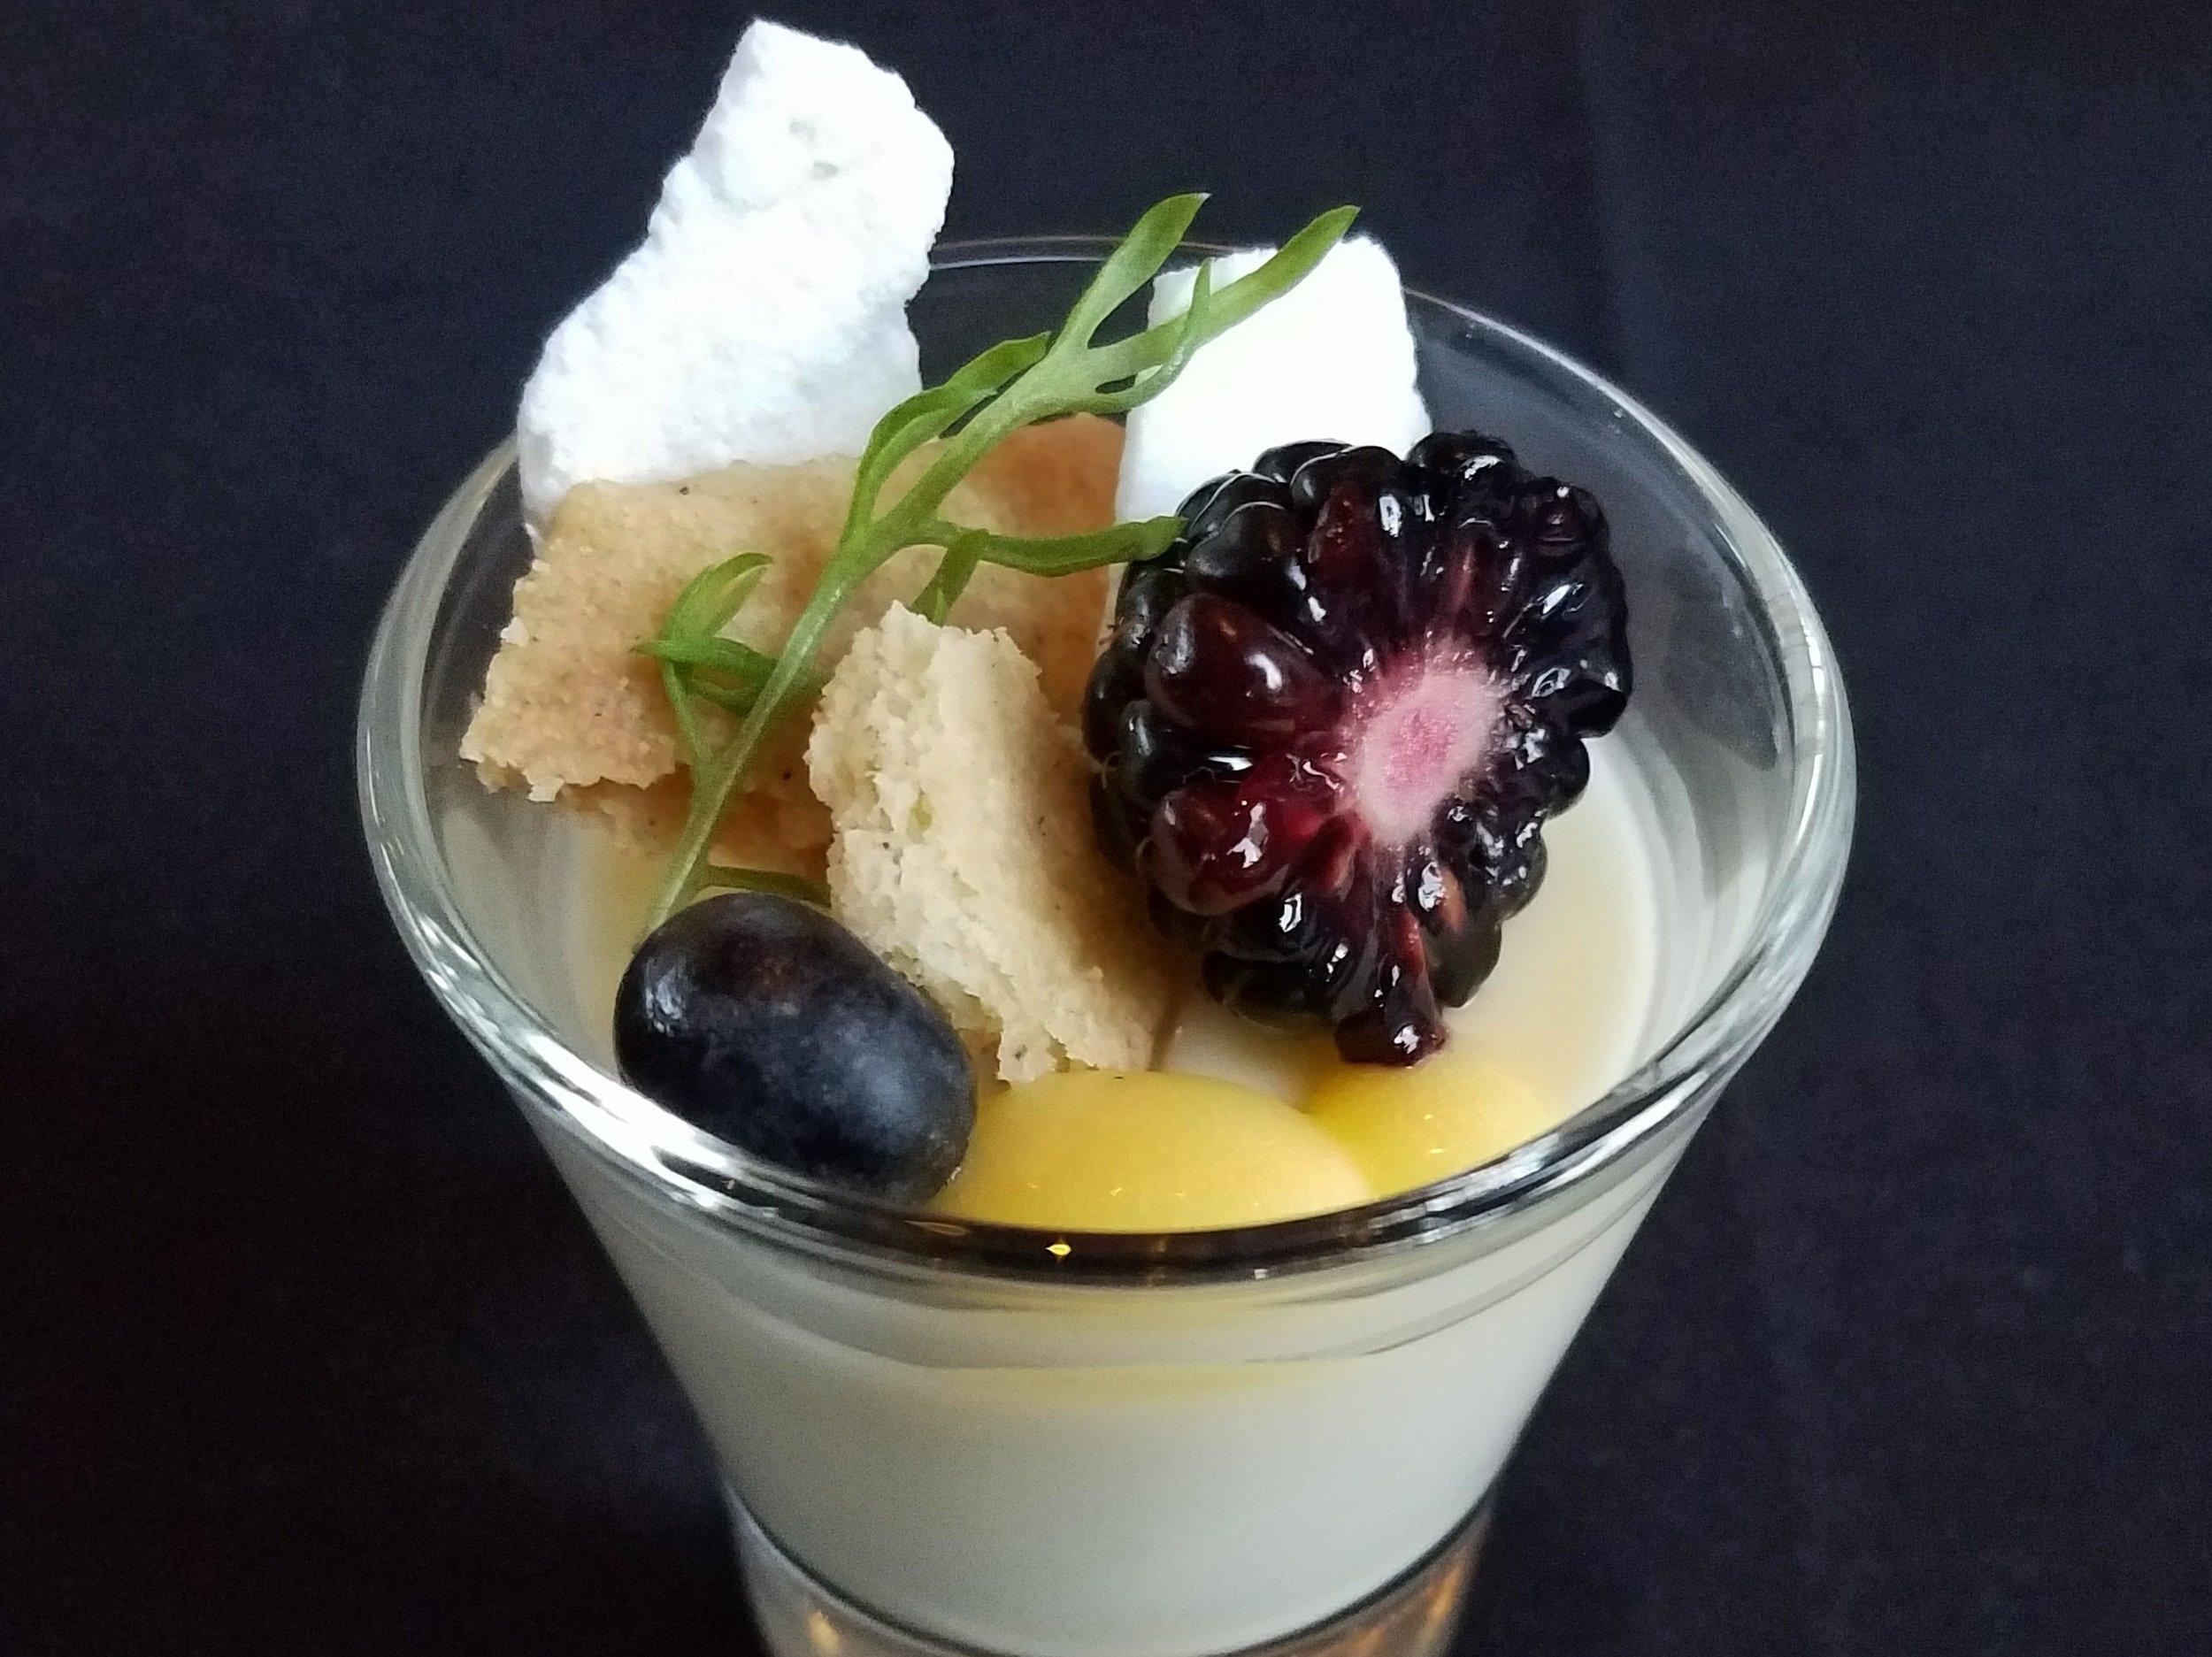 Lemon meringue posset: Meyer lemon posset with chamomile shortbread, fresh berries, Meyer lemon curd and dehydrated meringues